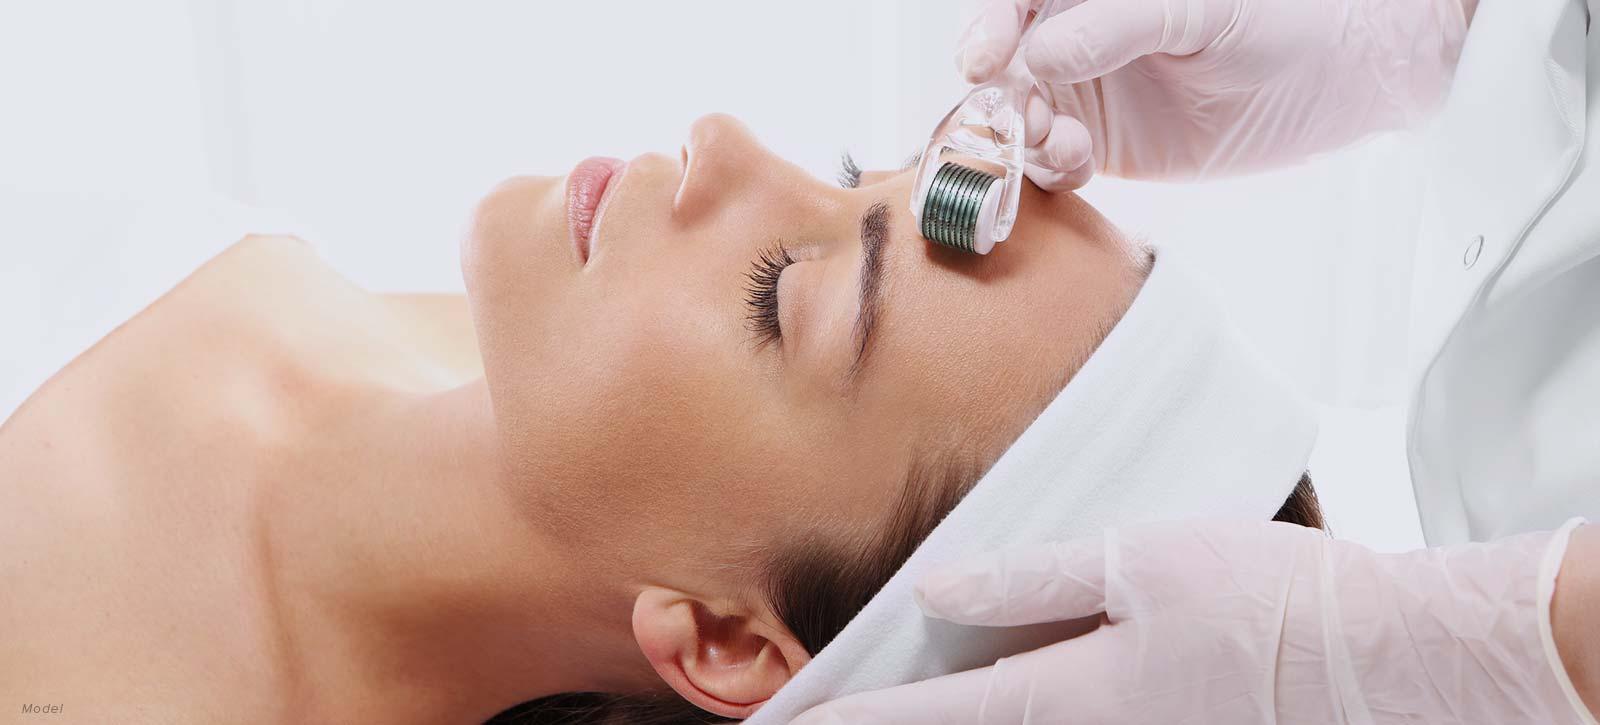 Woman getting skin treatment